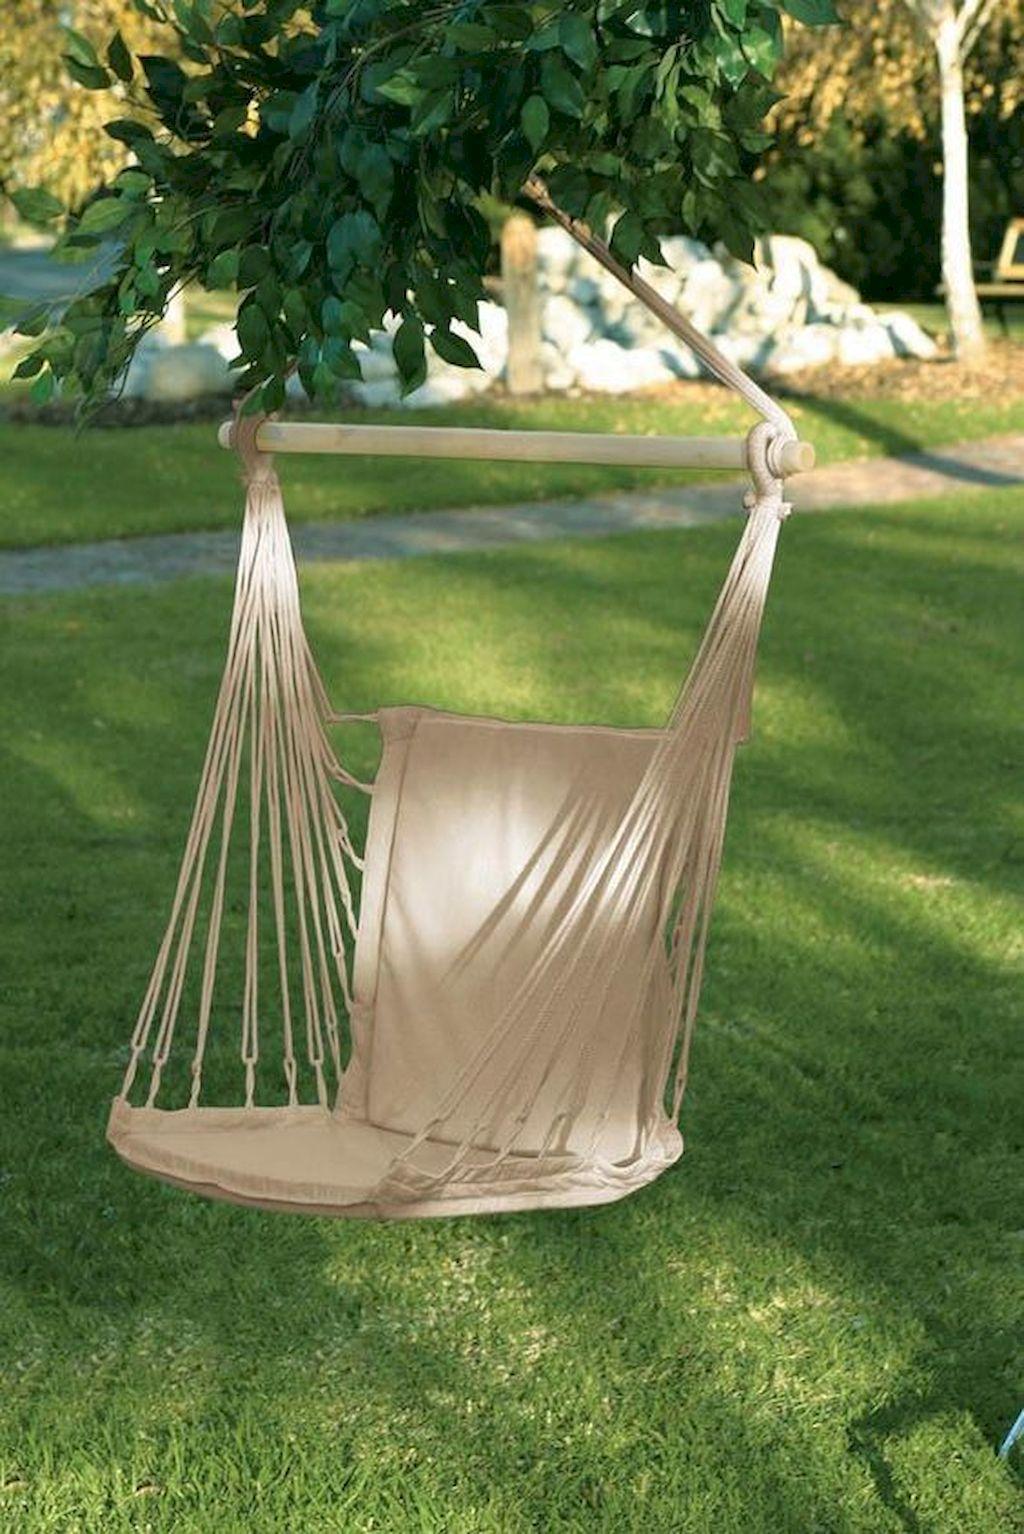 Awesome 65 lazyday backyard hammock and pergola ideas for